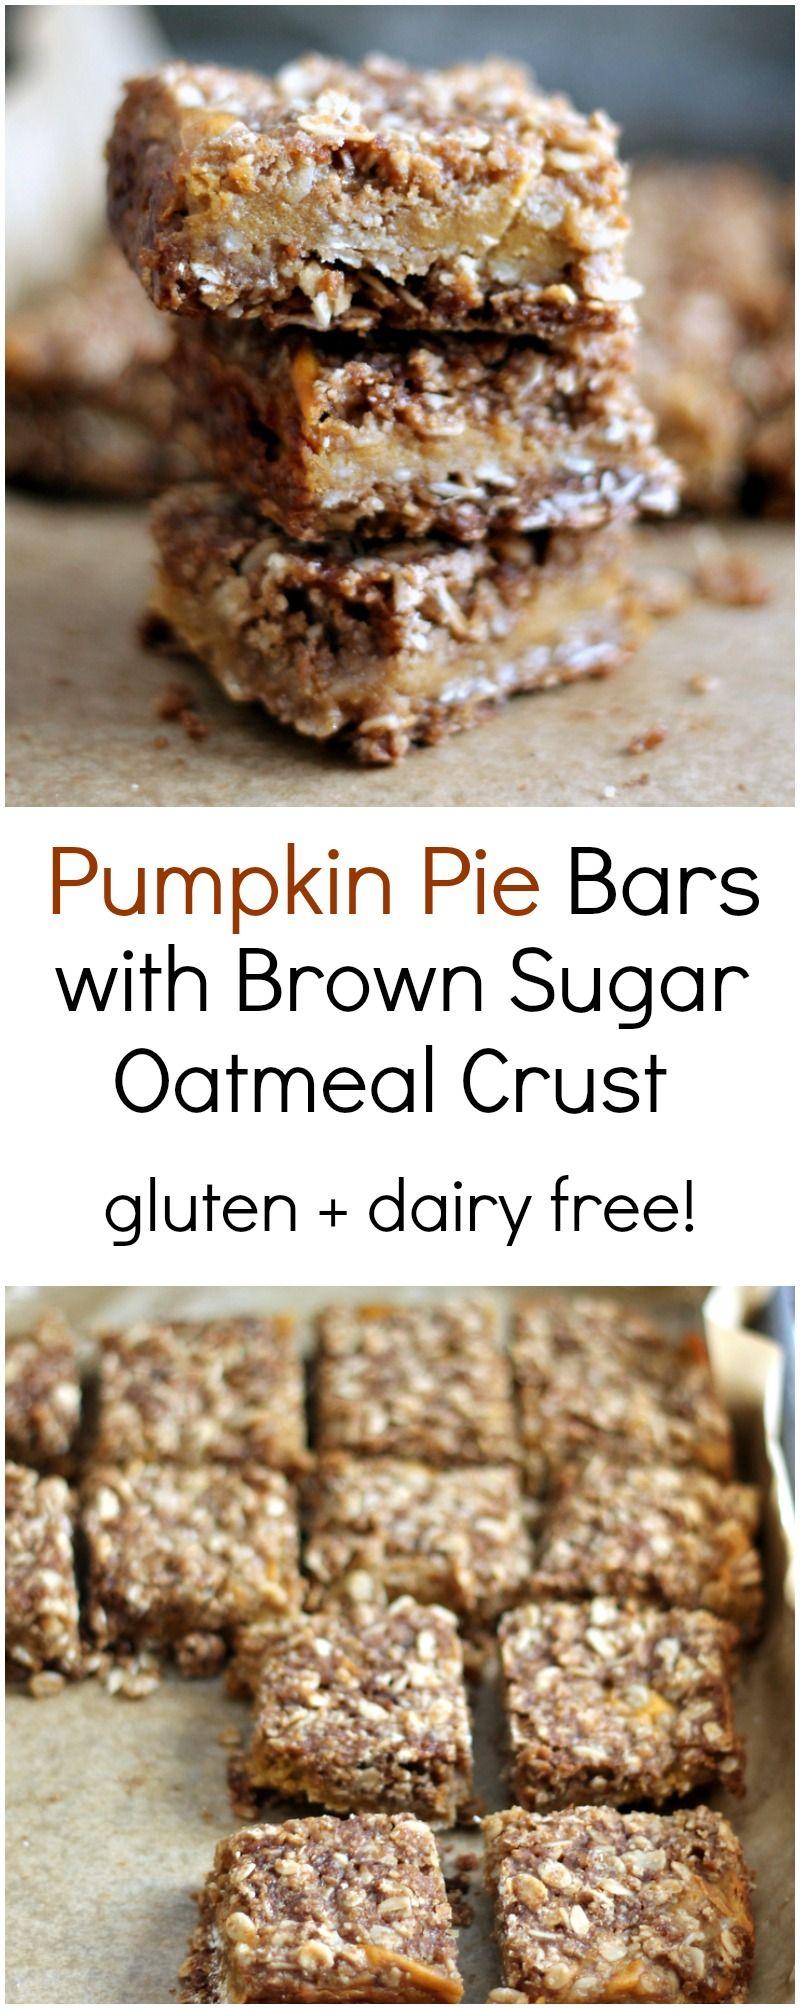 Pumpkin Pie Bars With Brown Sugar Oatmeal Crust Ambitious Kitchen Recipe Pumpkin Pie Bars Gluten Free Pumpkin Pie Bars Gluten Free Bars